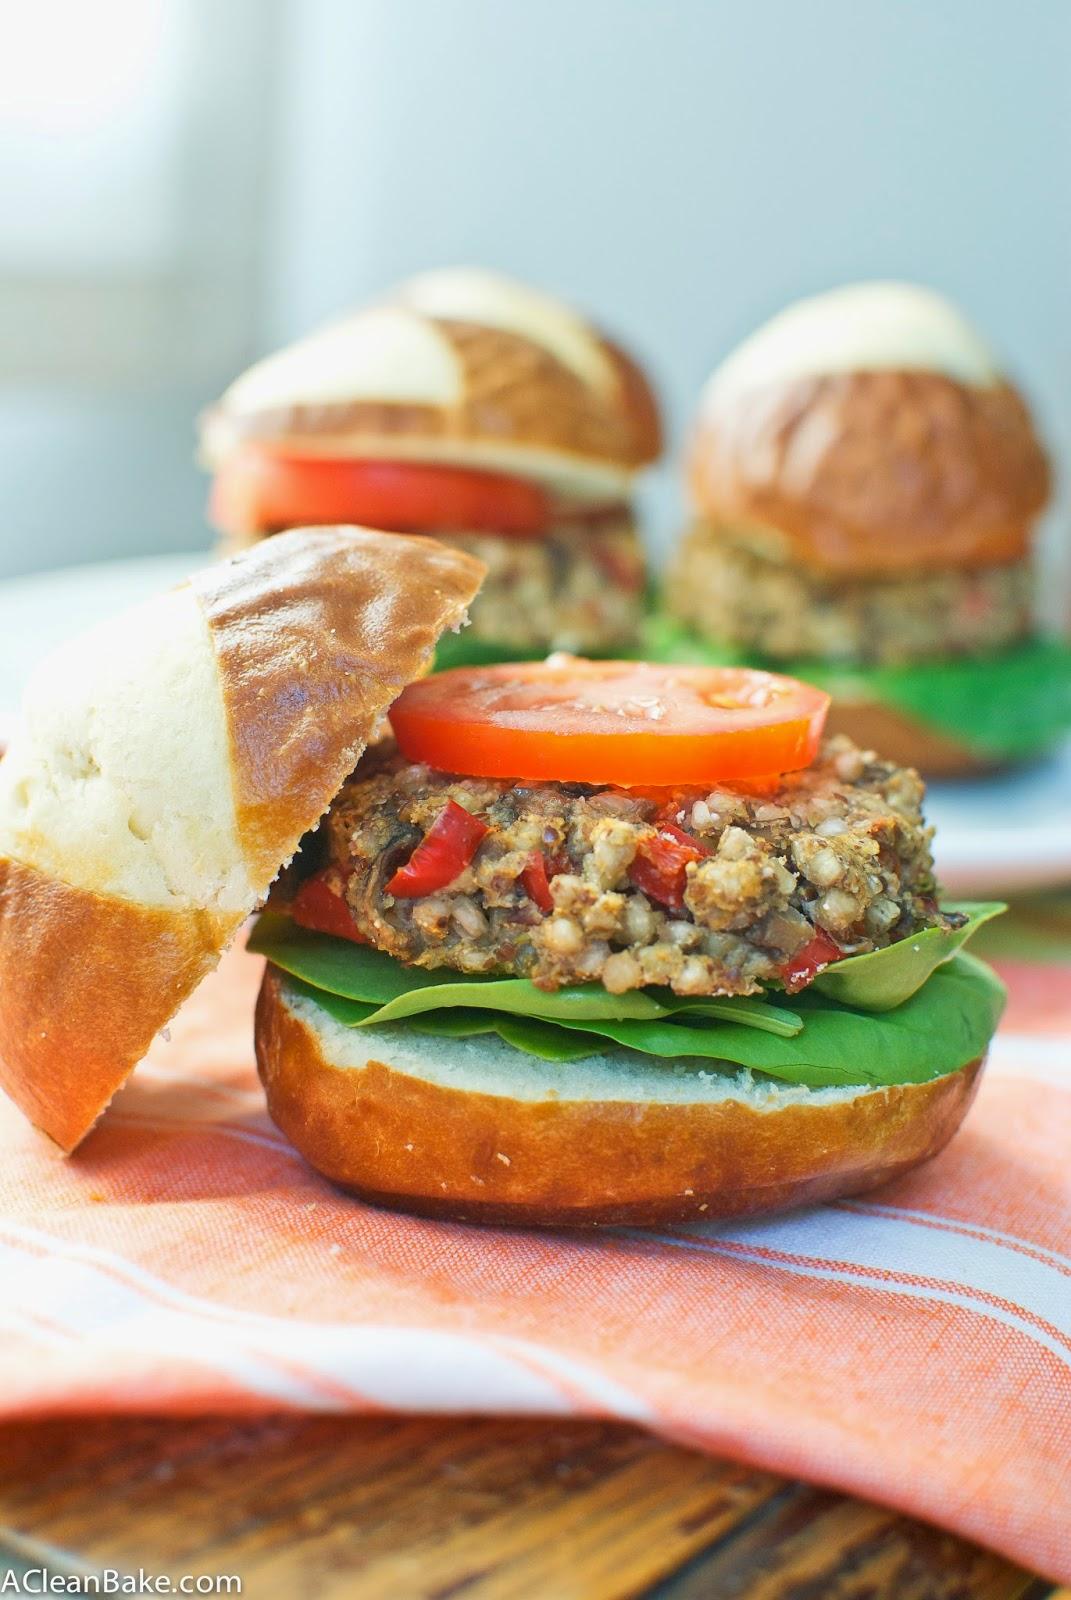 Paleo Veggie Sliders (Gluten-free, grain-free, bean-free)